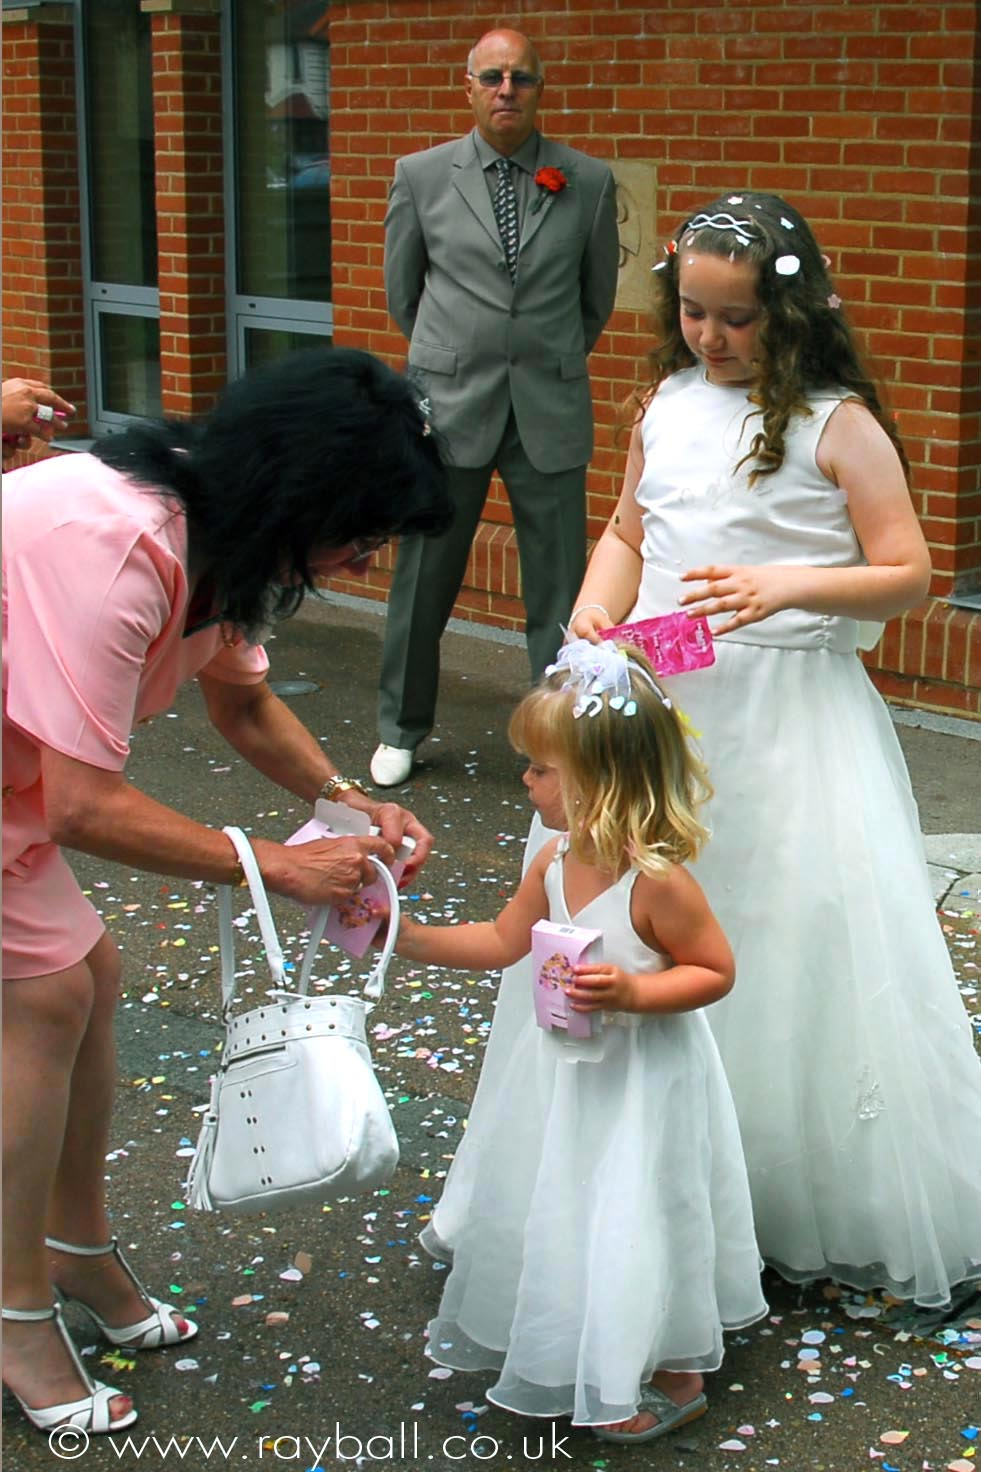 Wedding moment caught in Long Ditton, Elmbridge.